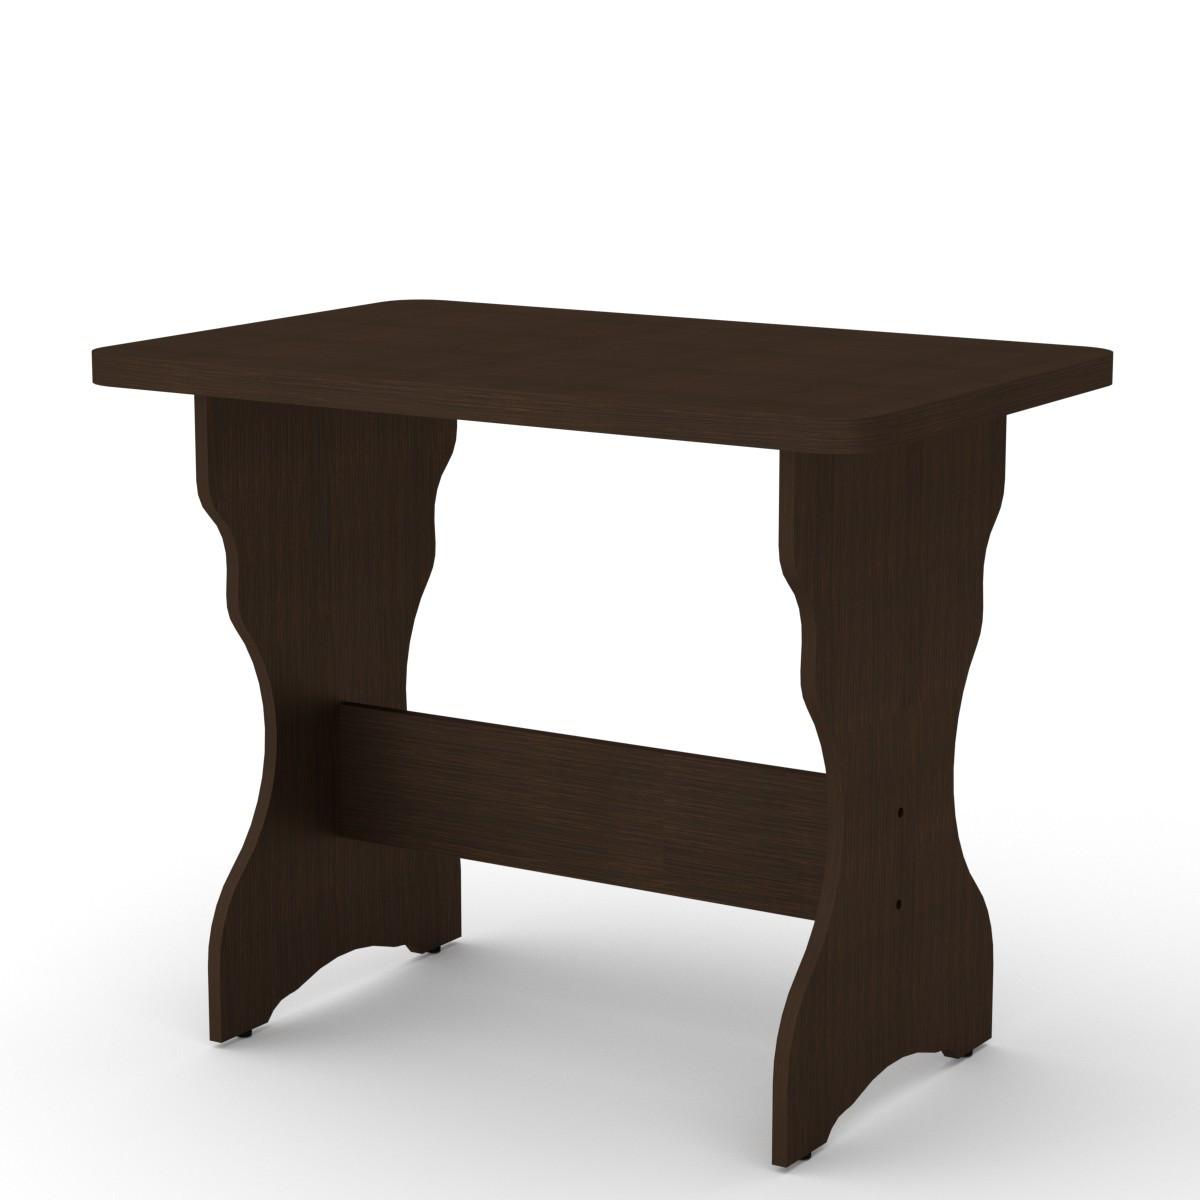 Стол кухонный КС-3 яблоня Компанит (90х59х73 см), фото 9